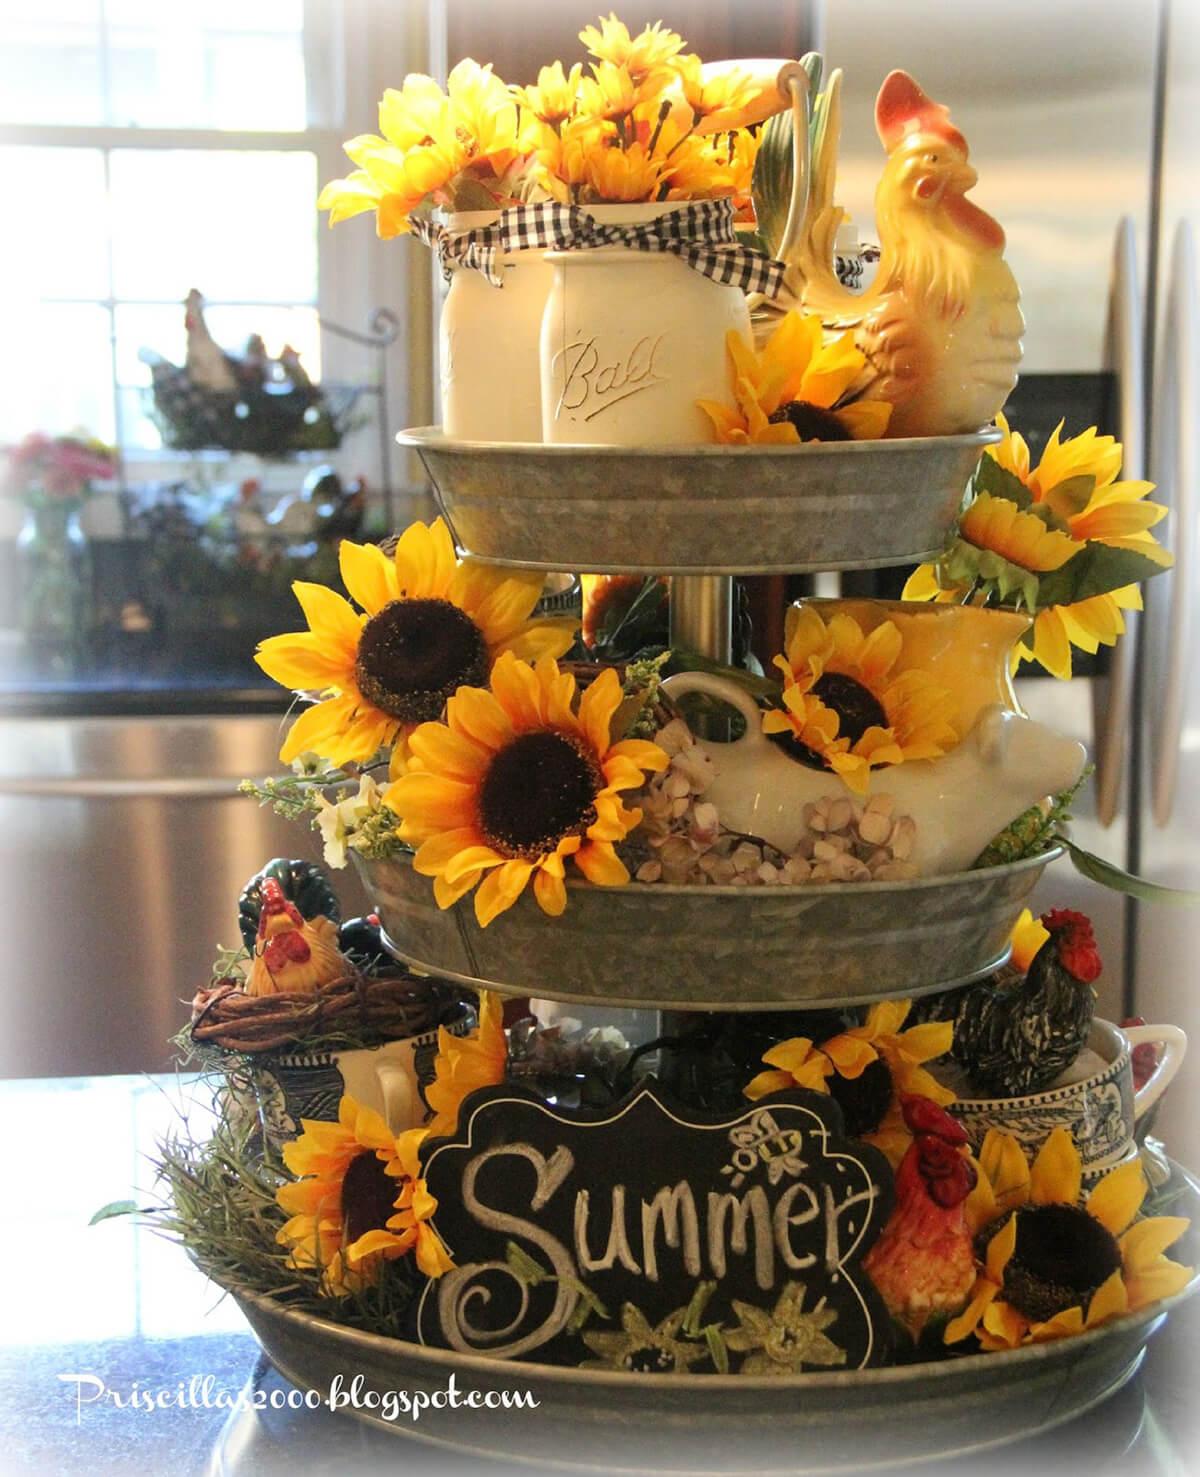 Sunflower Summer Tiered Tray Display